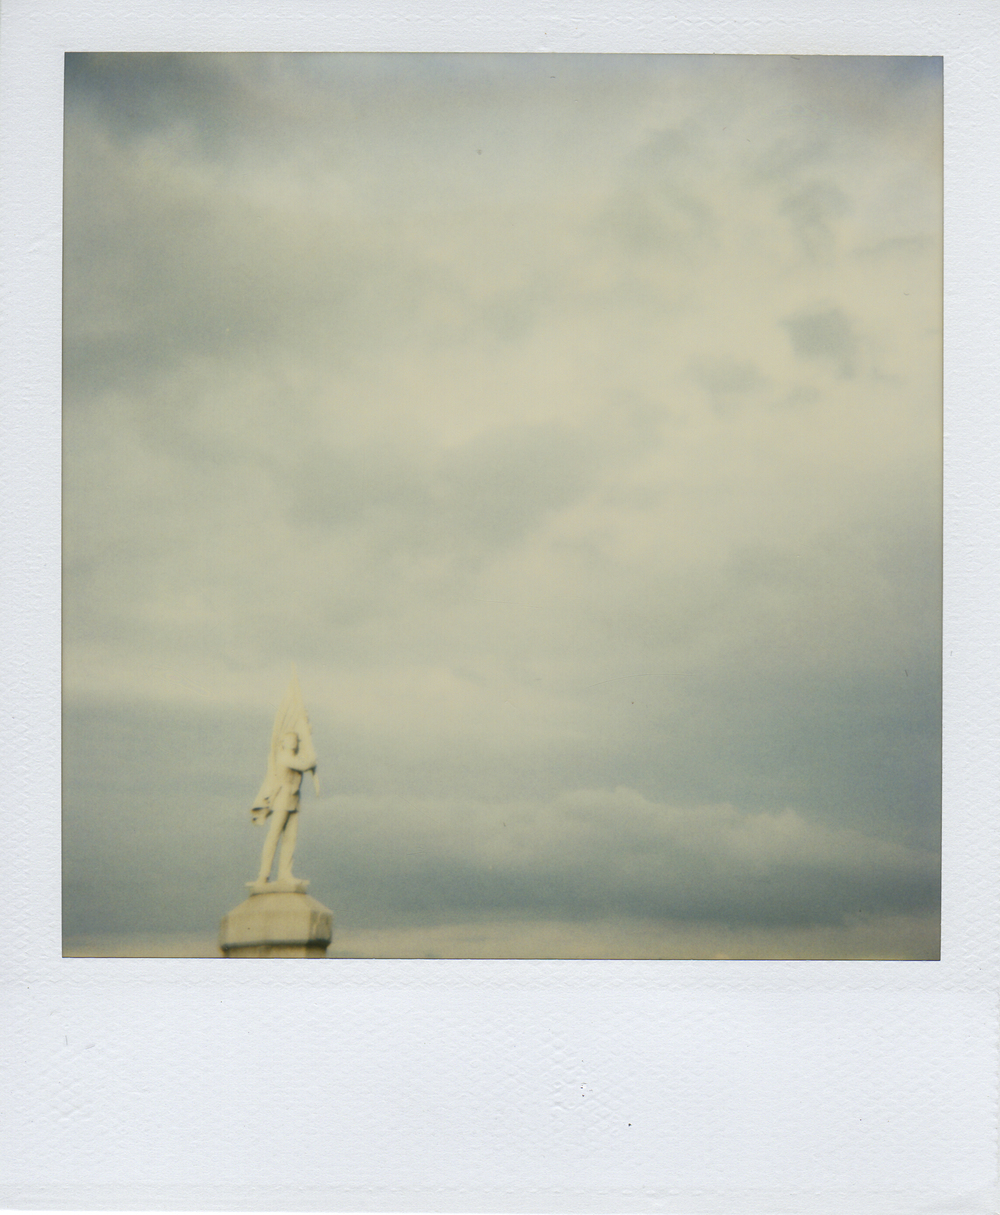 jlaurence-polaroid-038.jpg